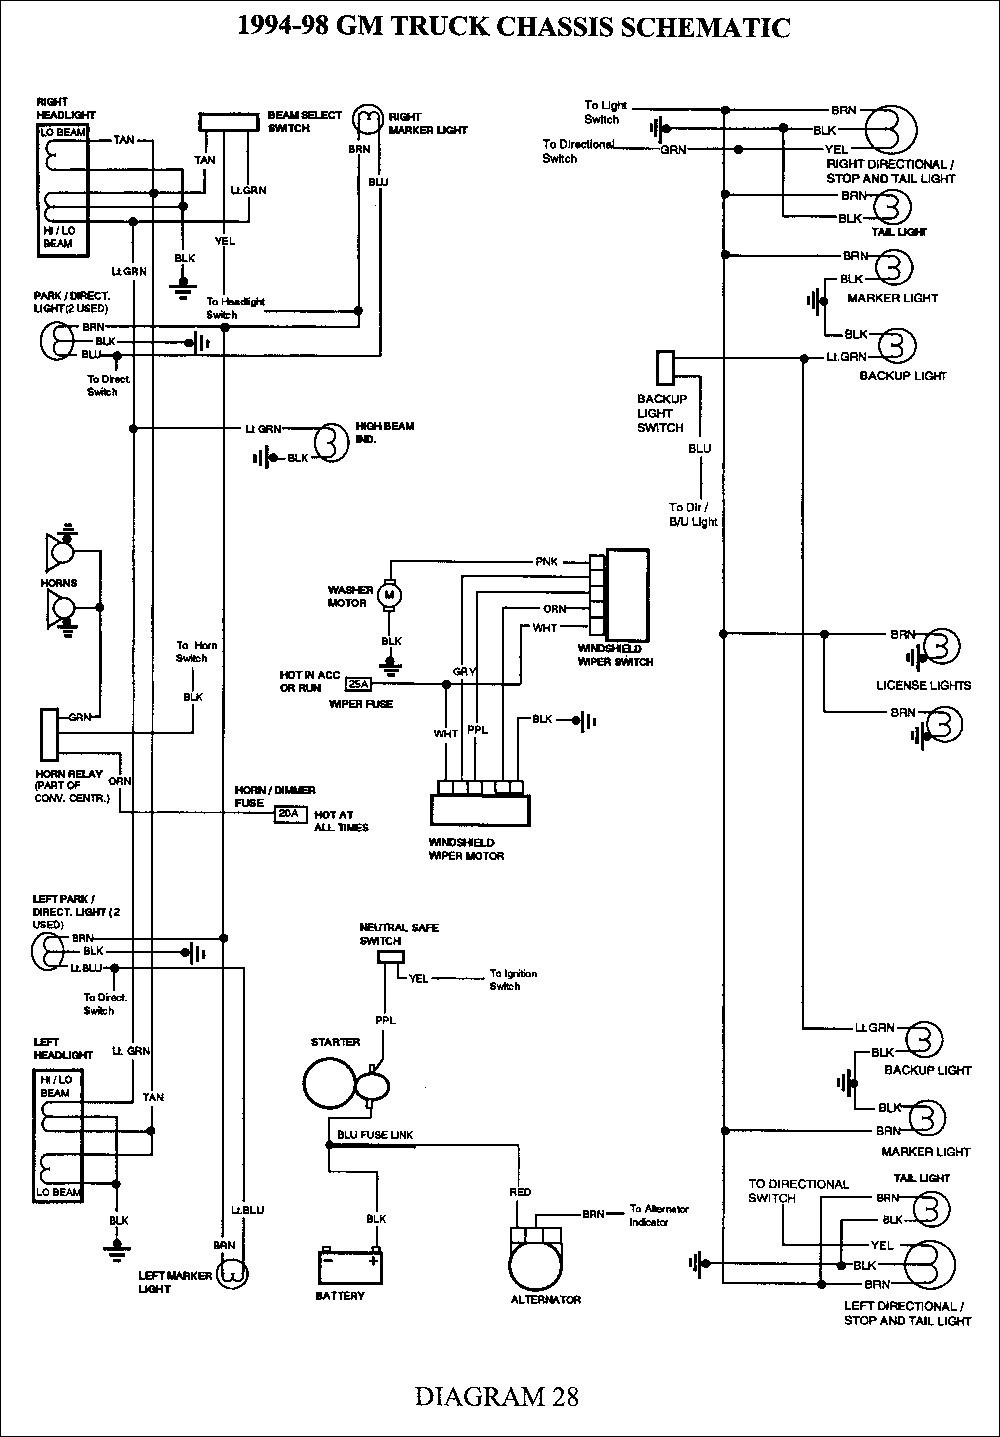 Chevy C5500 Wiring | Wiring Library - 2004 Chevy Silverado Wiring Diagram